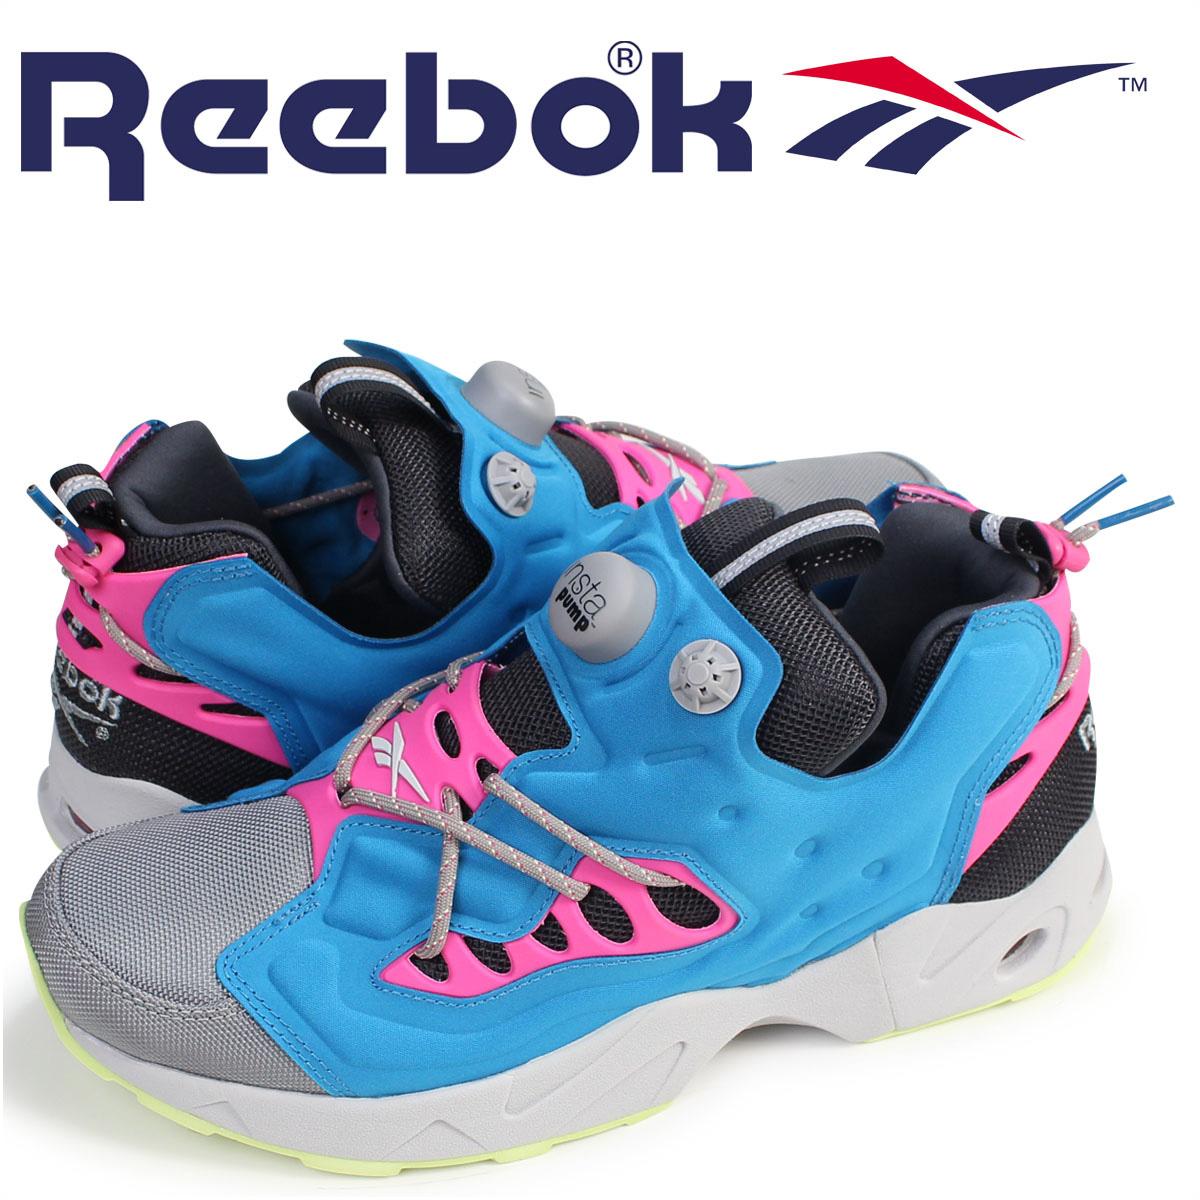 Reebok ポンプフューリー スニーカー リーボック INSTAPUMP FURY ROAD TR AR0013 メンズ 靴 ターコイズ